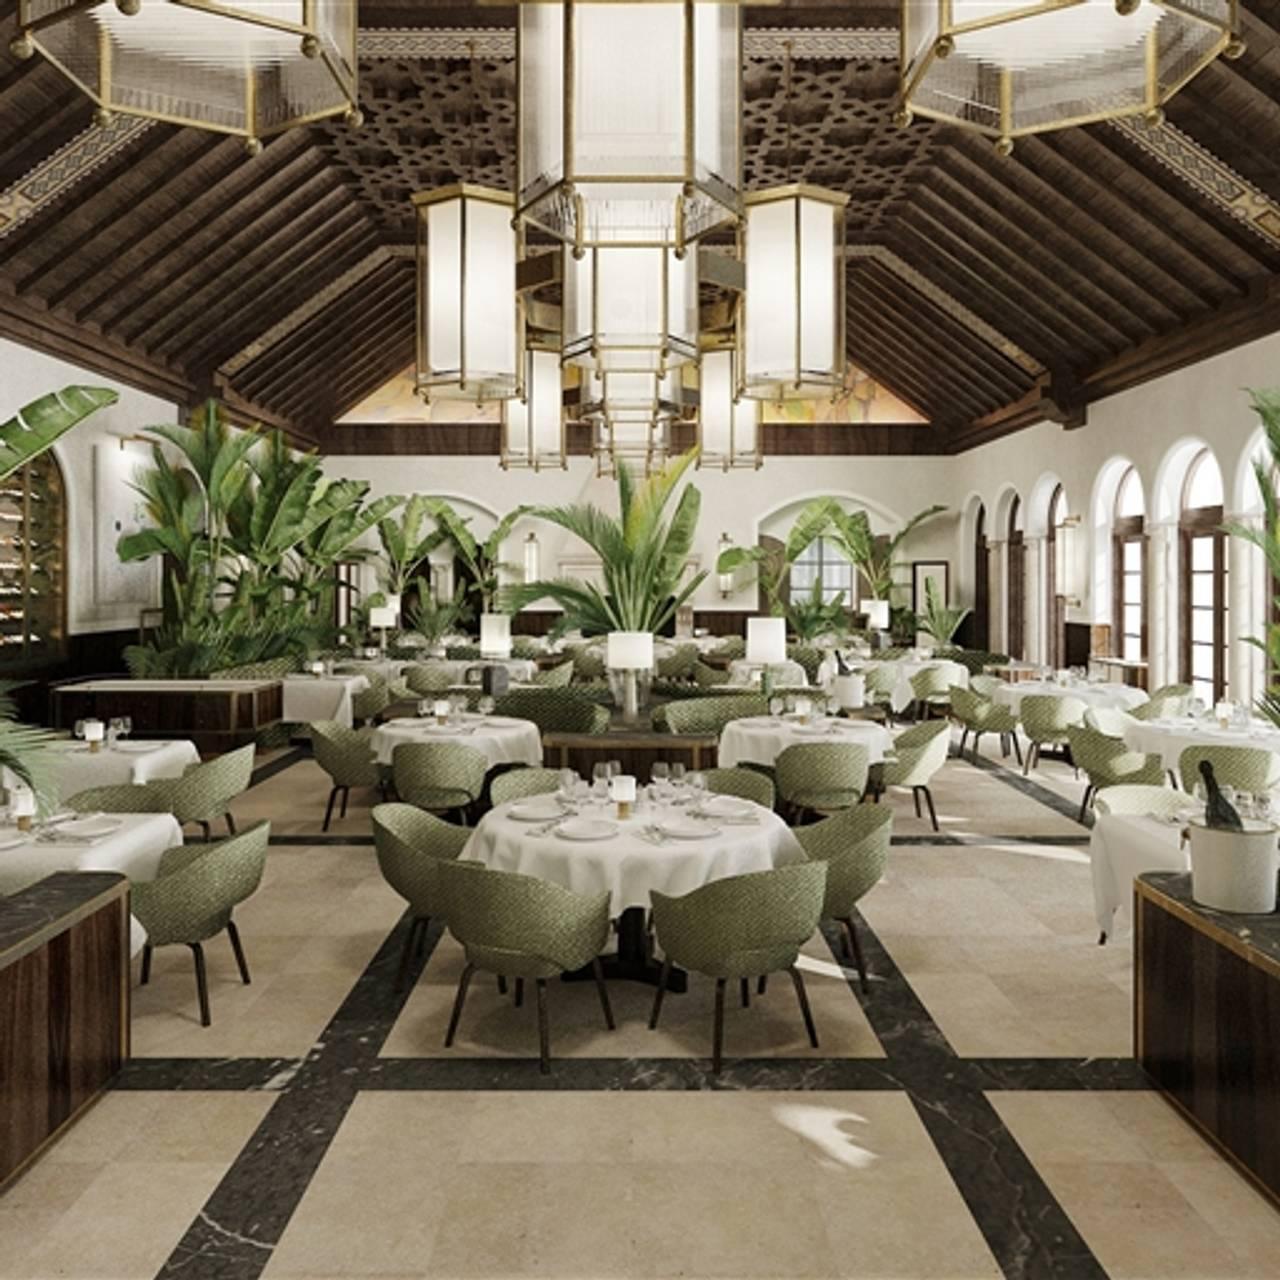 Le Sirenuse Miami Restaurant Surfside Fl